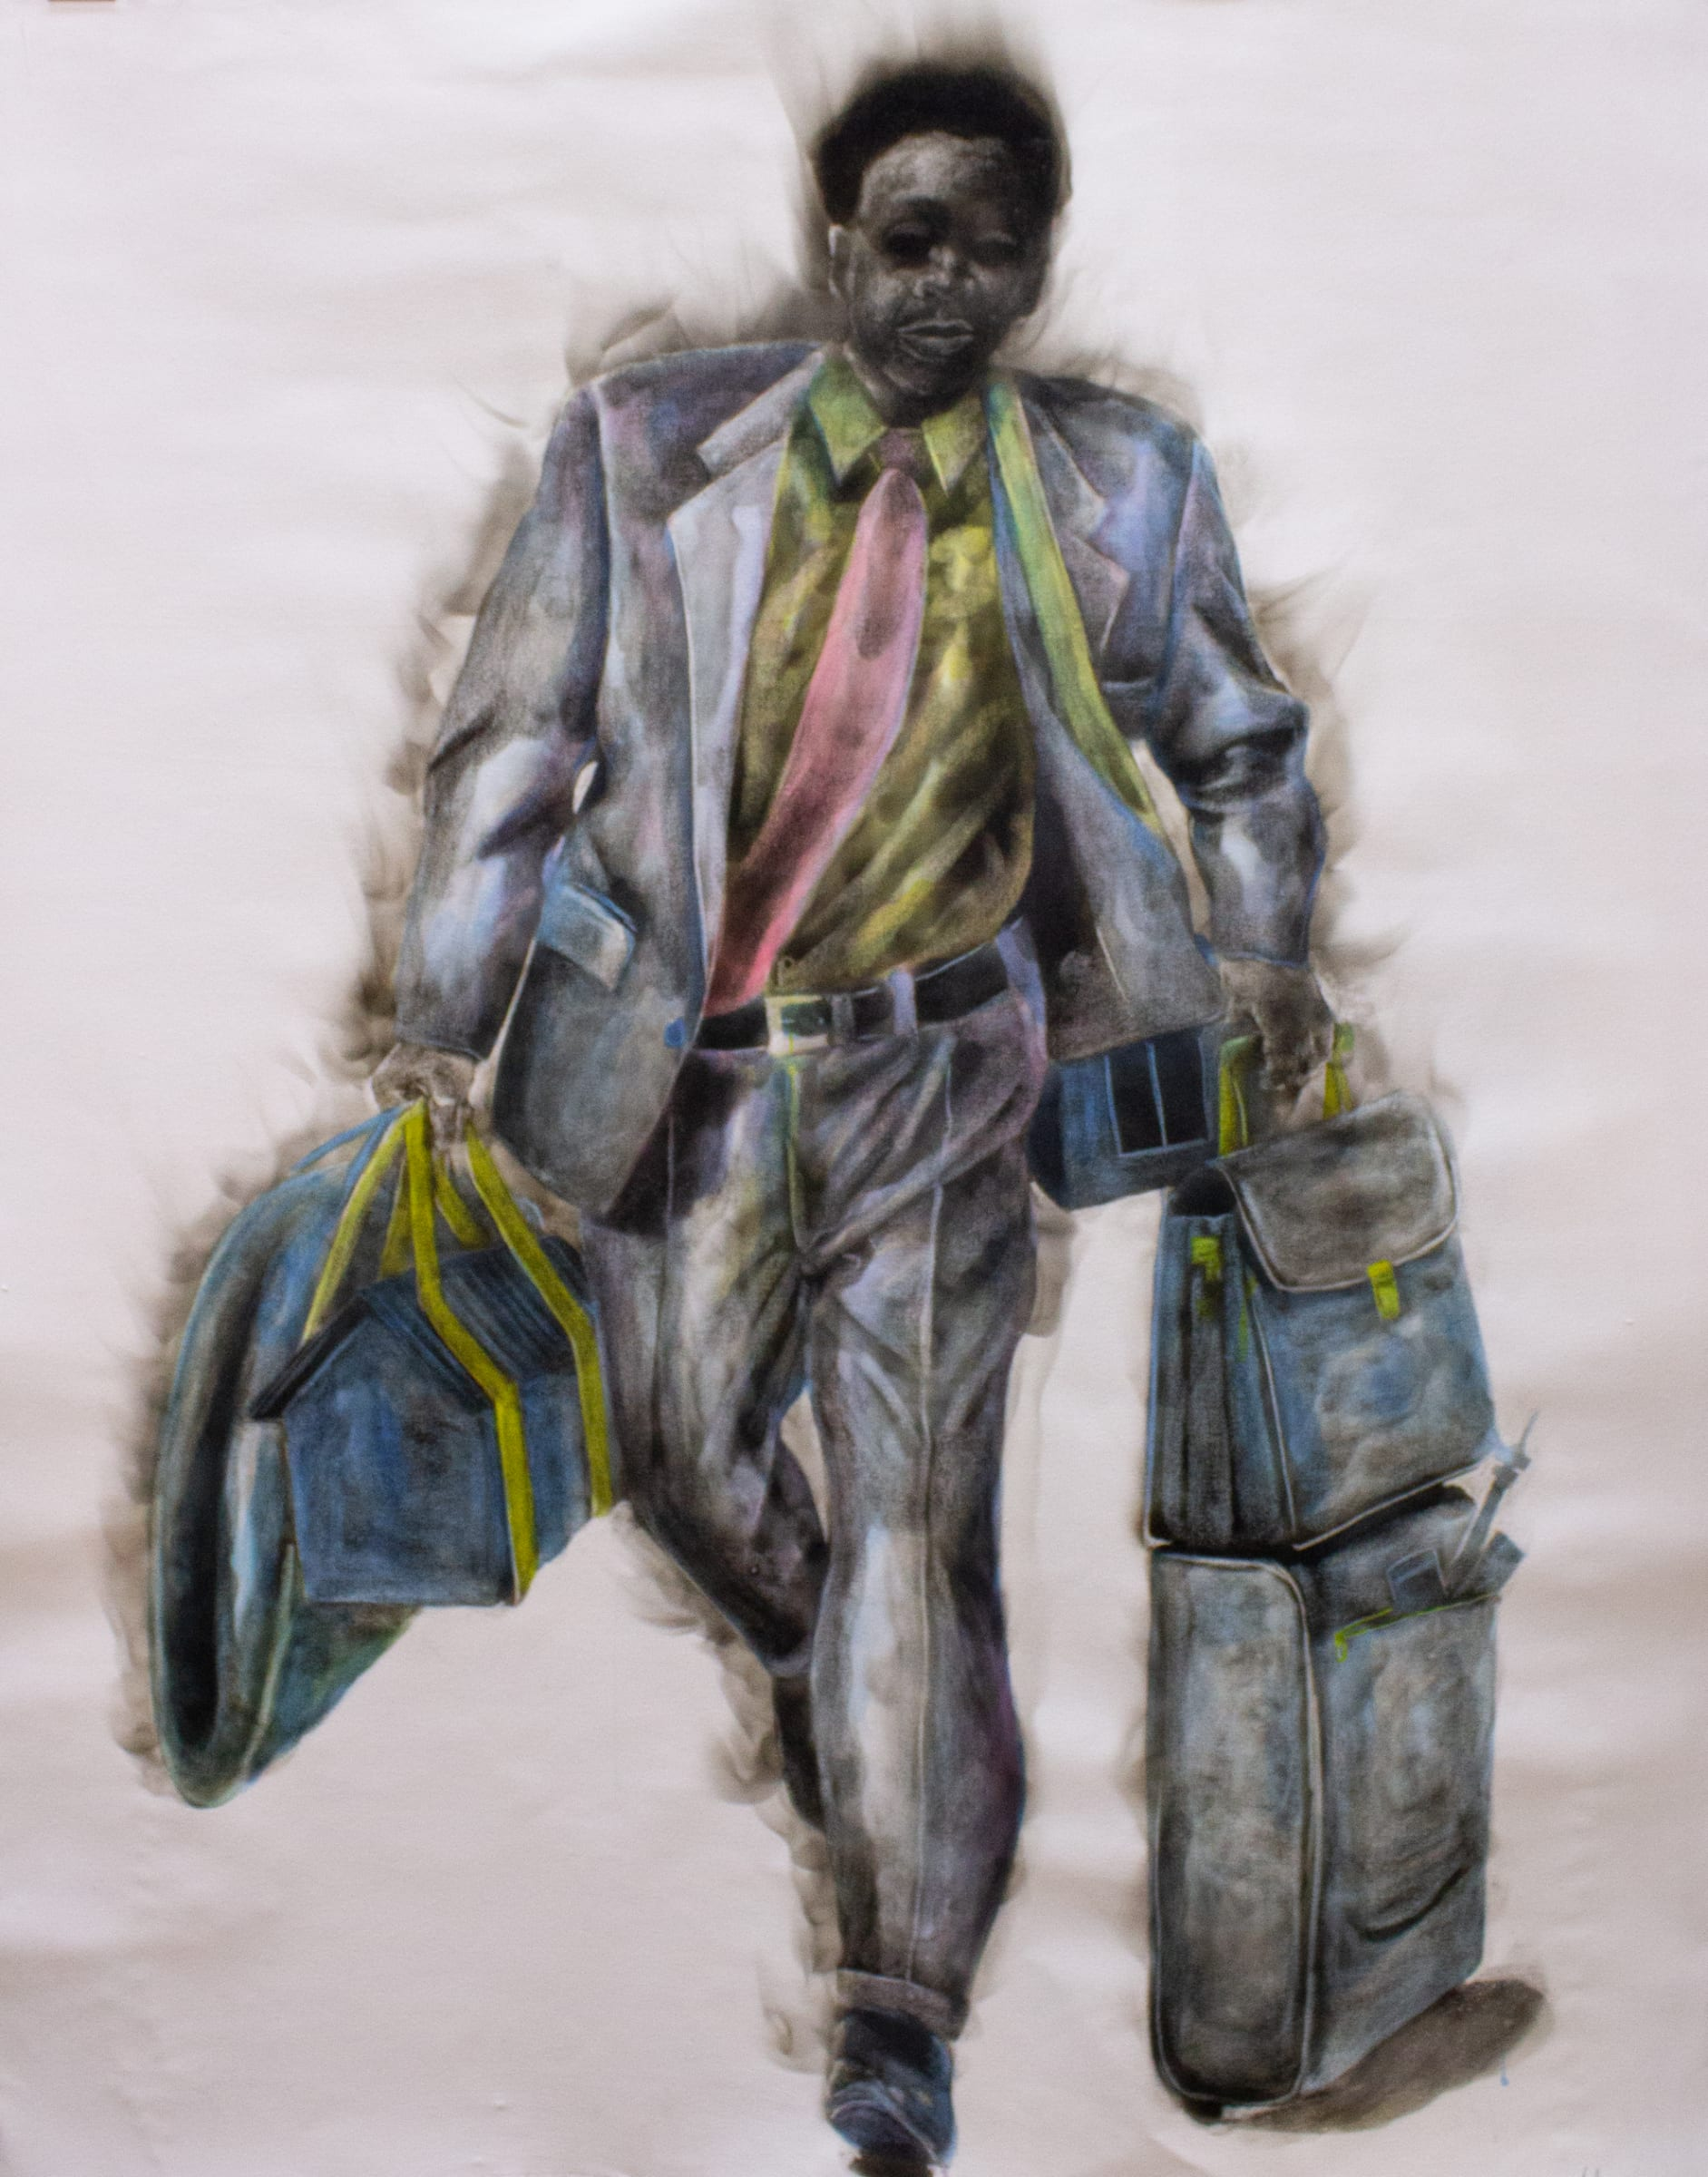 <span class=&#34;link fancybox-details-link&#34;><a href=&#34;/artists/54-azael-langa/works/2179-azael-langa-homesick-2018/&#34;>View Detail Page</a></span><div class=&#34;artist&#34;><strong>Azael Langa</strong></div> <div class=&#34;title&#34;><em>Homesick</em>, 2018</div> <div class=&#34;medium&#34;>Smoke And Ink  On Canvas</div> <div class=&#34;dimensions&#34;>160cm x 130cm</div>